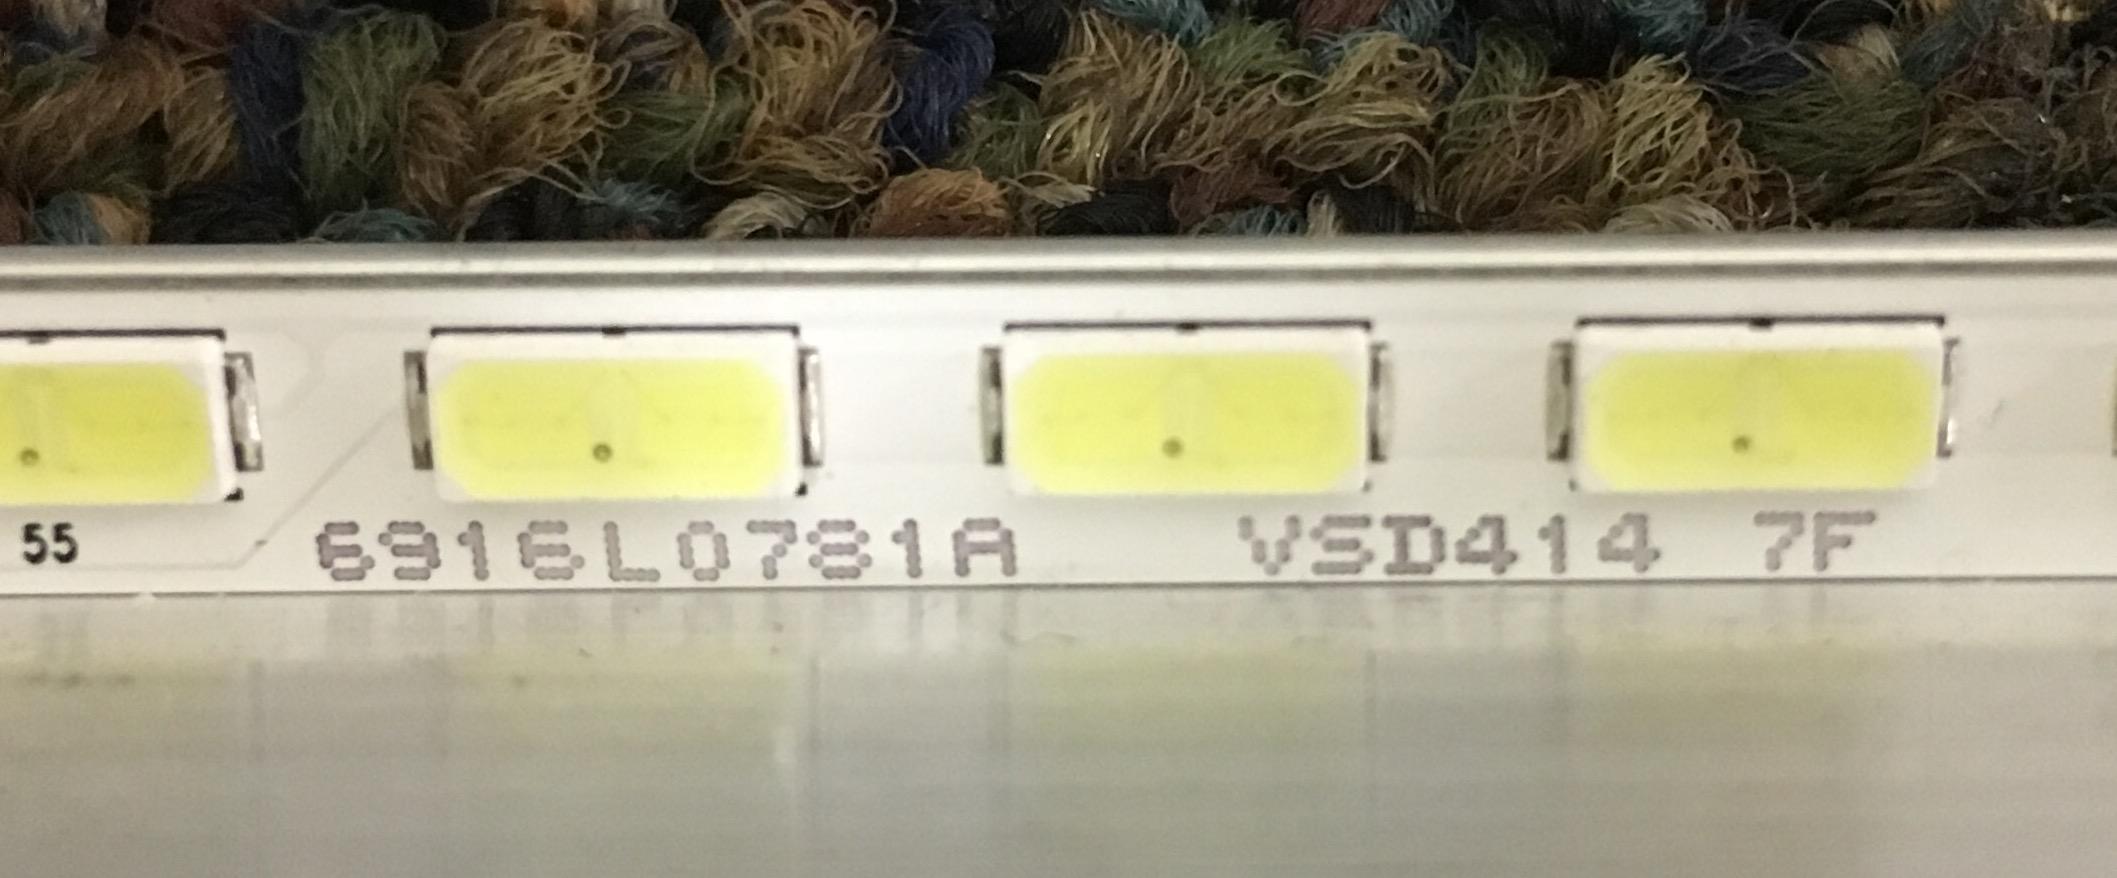 6916l0781a Led Strip With Heat Sink Tv Repair Kits